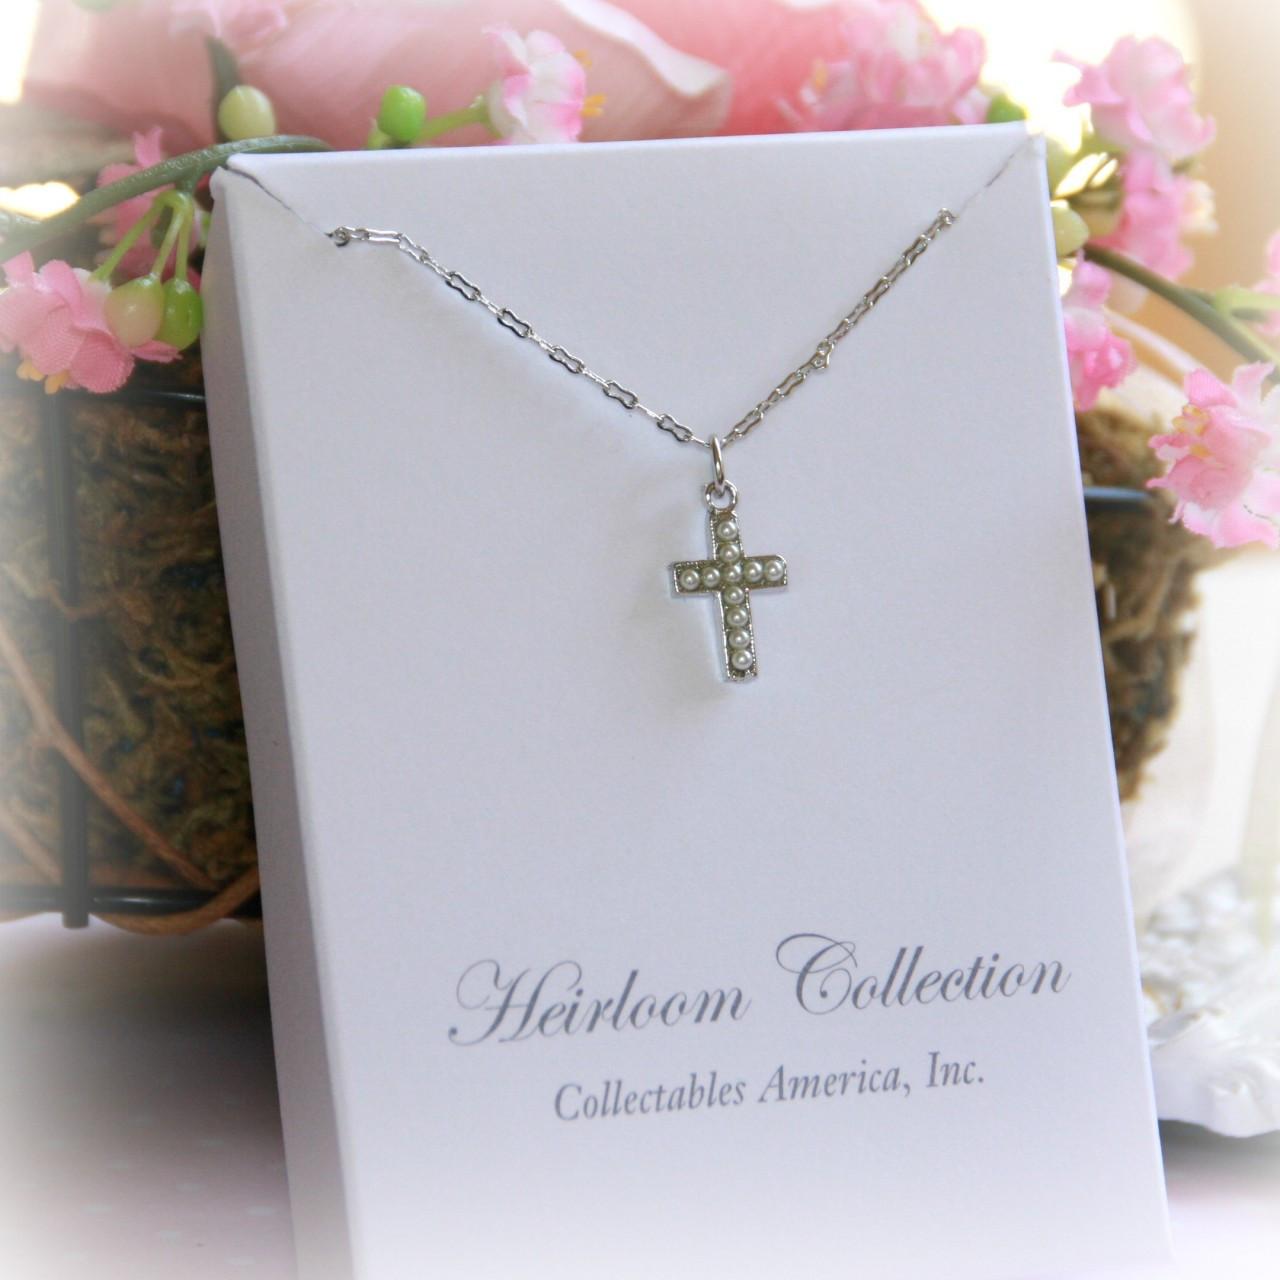 RH-18  Rhodium Seed Pearl Cross Necklace